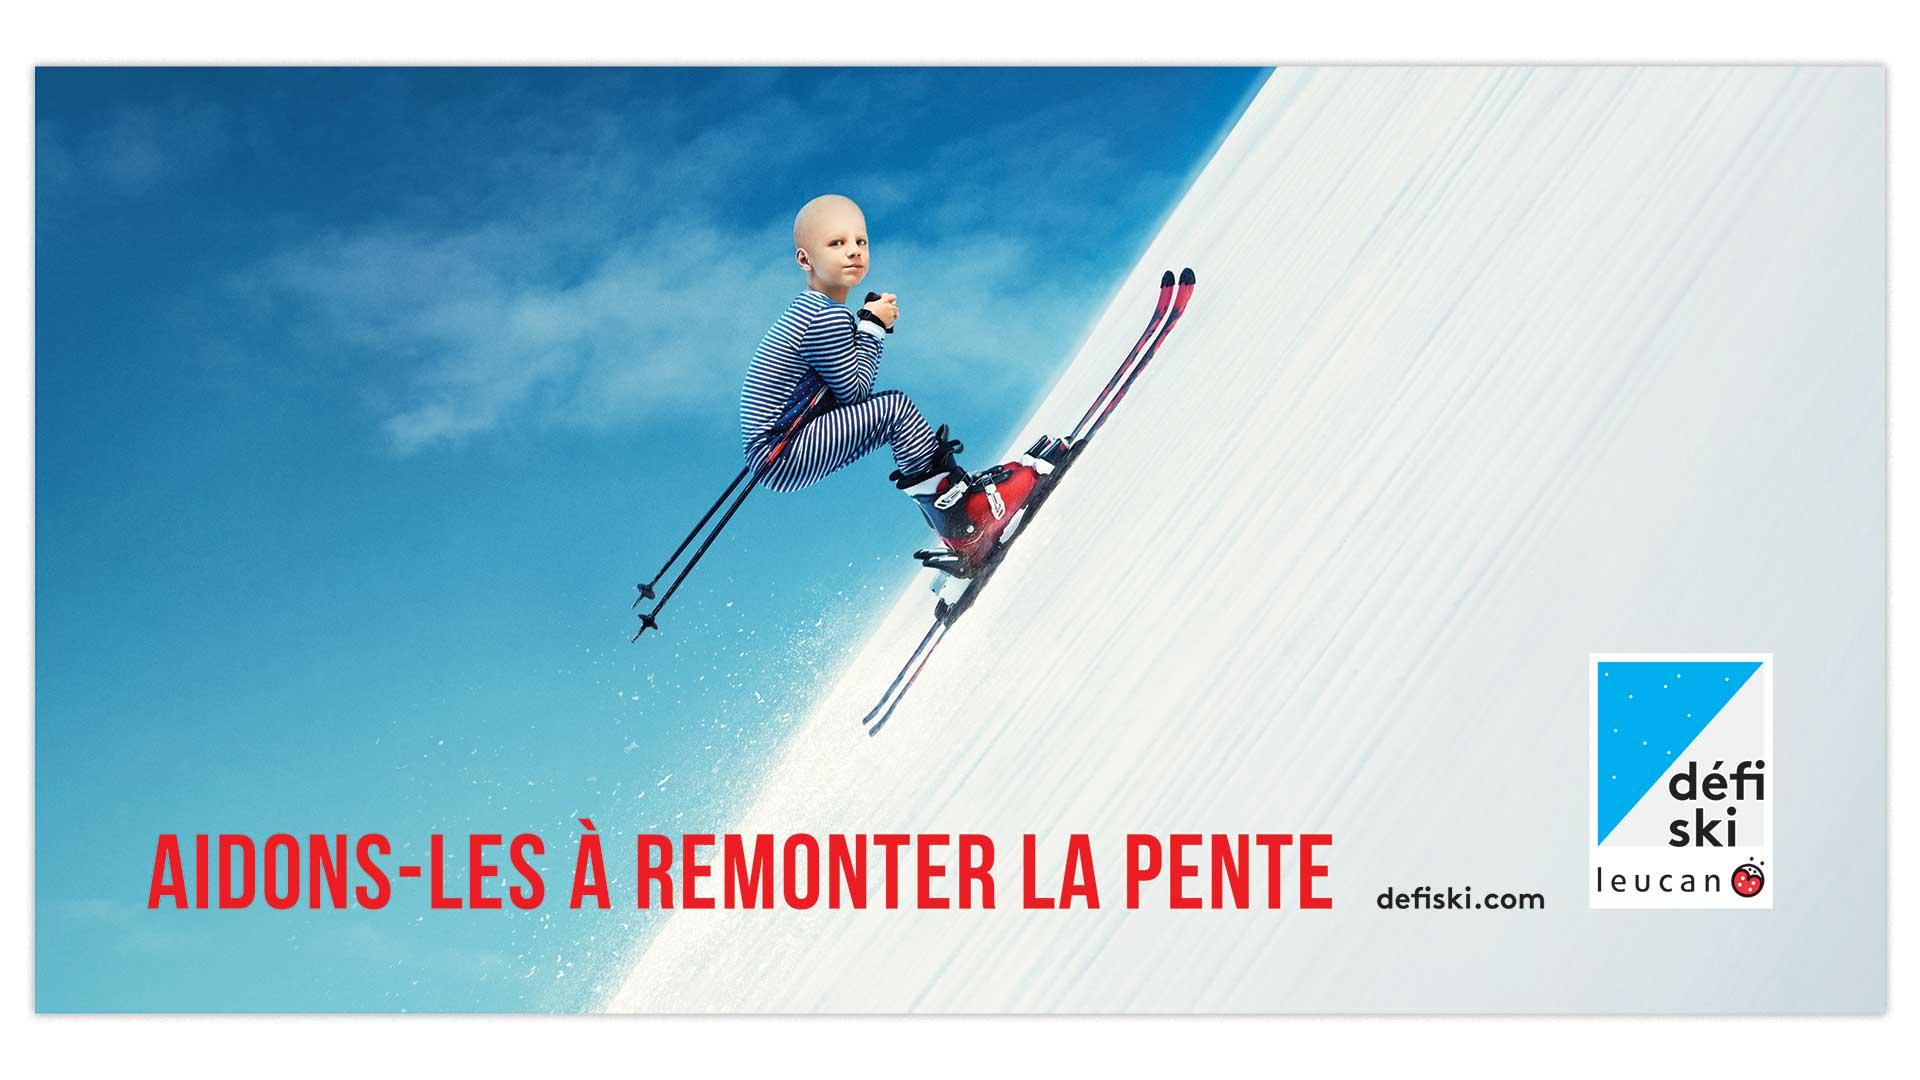 Leucan  Dfi ski  compagnie et cie